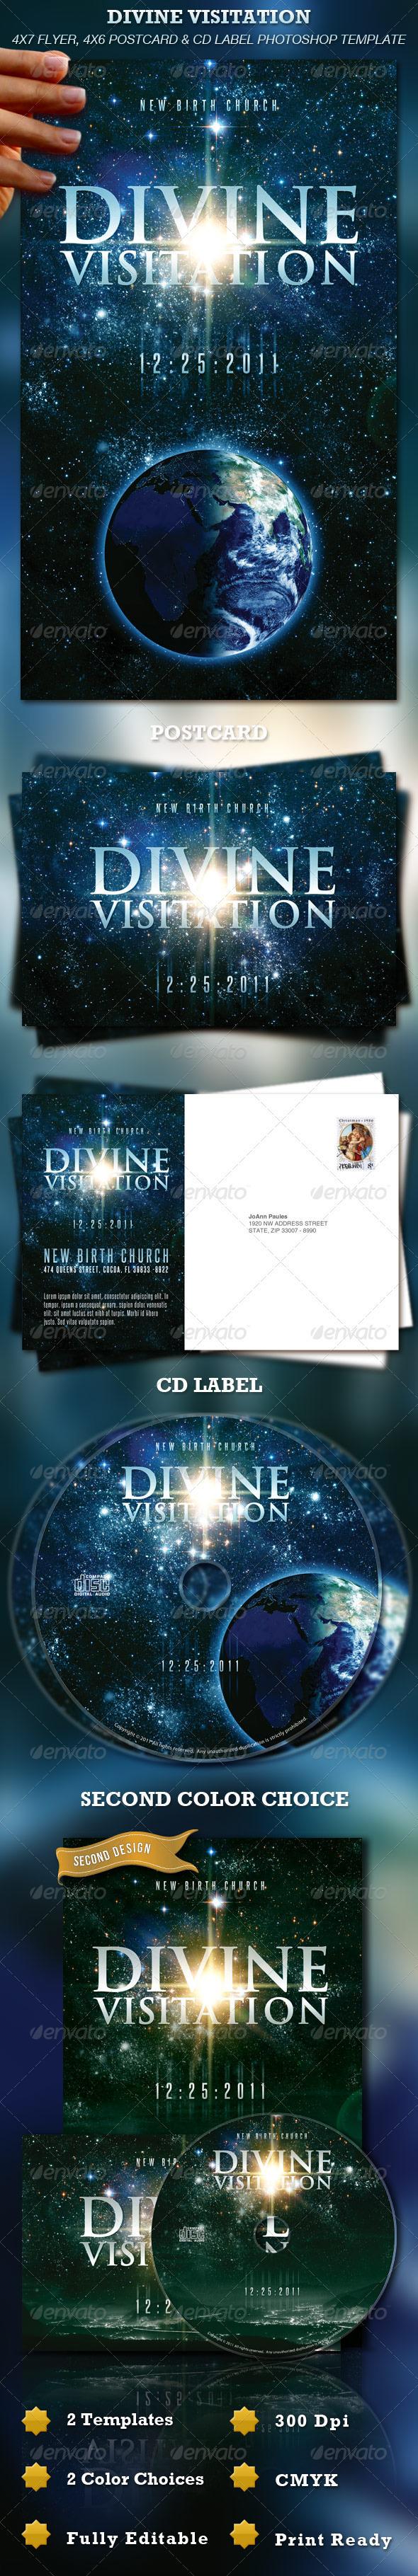 Divine Visitation Flyer, Postcard & CD Label - Church Flyers